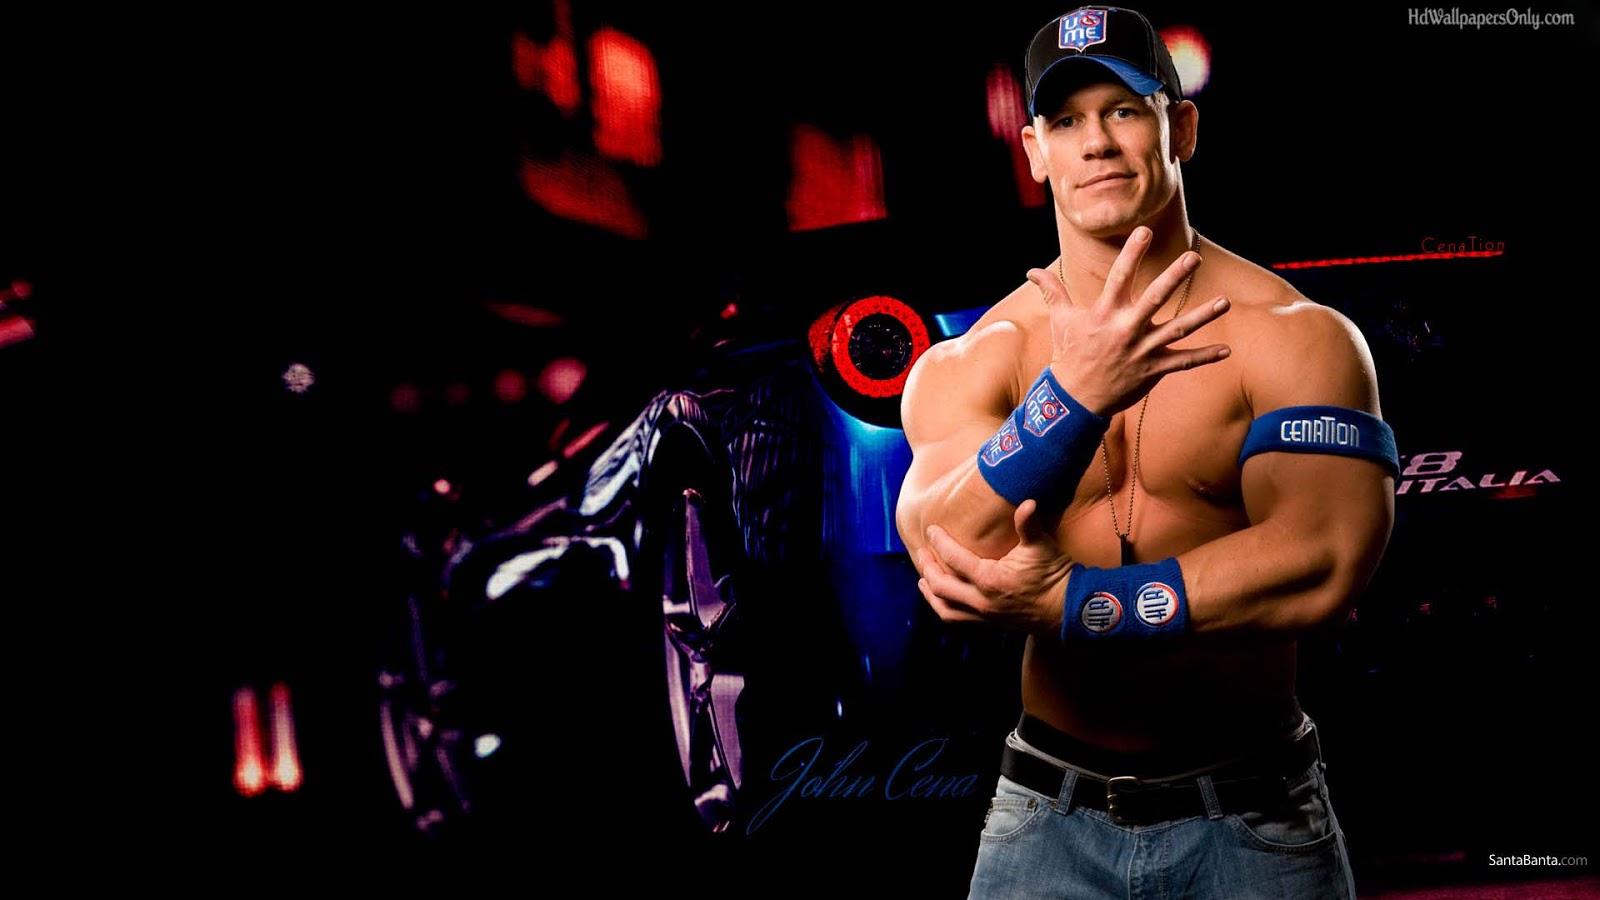 John Cena 2016 Wallpaper HD